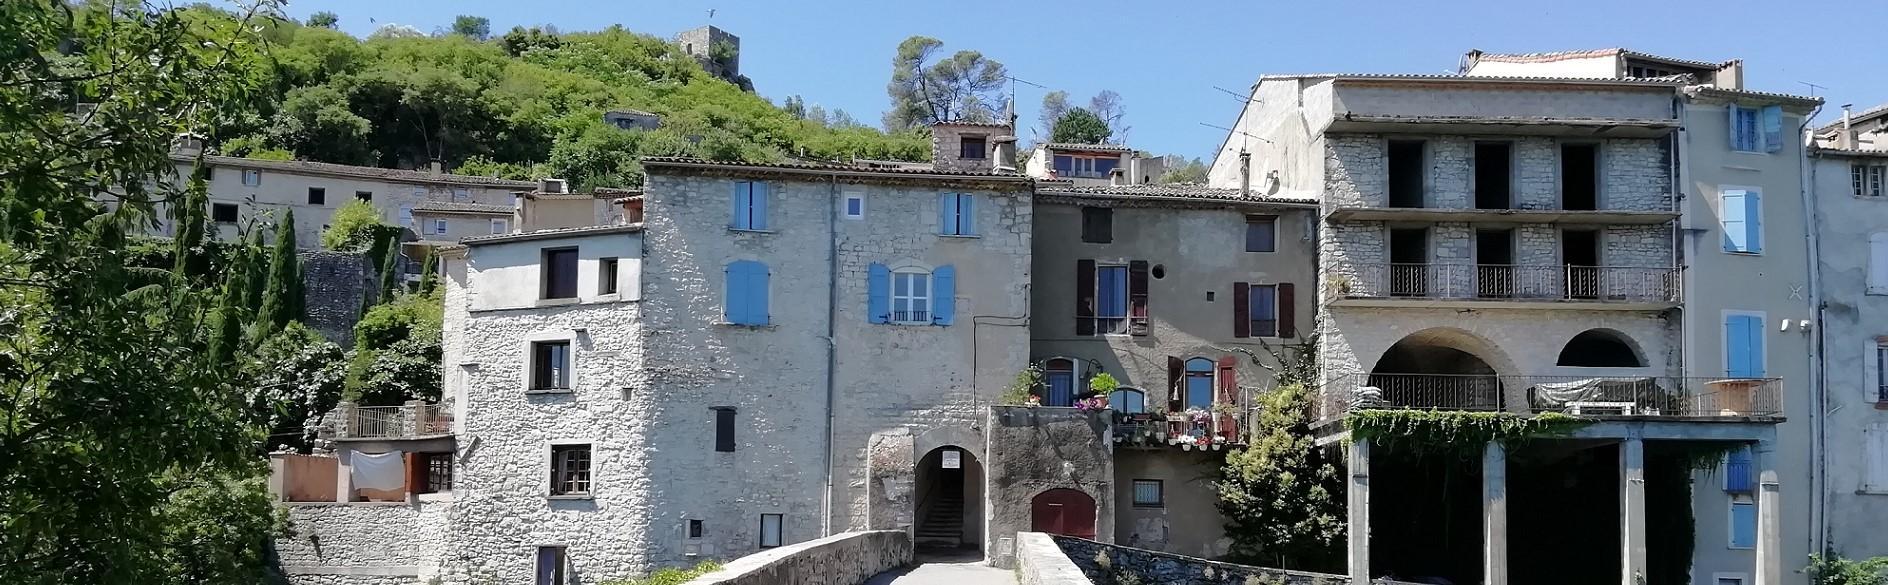 Screenshot 2 sauve bandeau chateau pont vieux